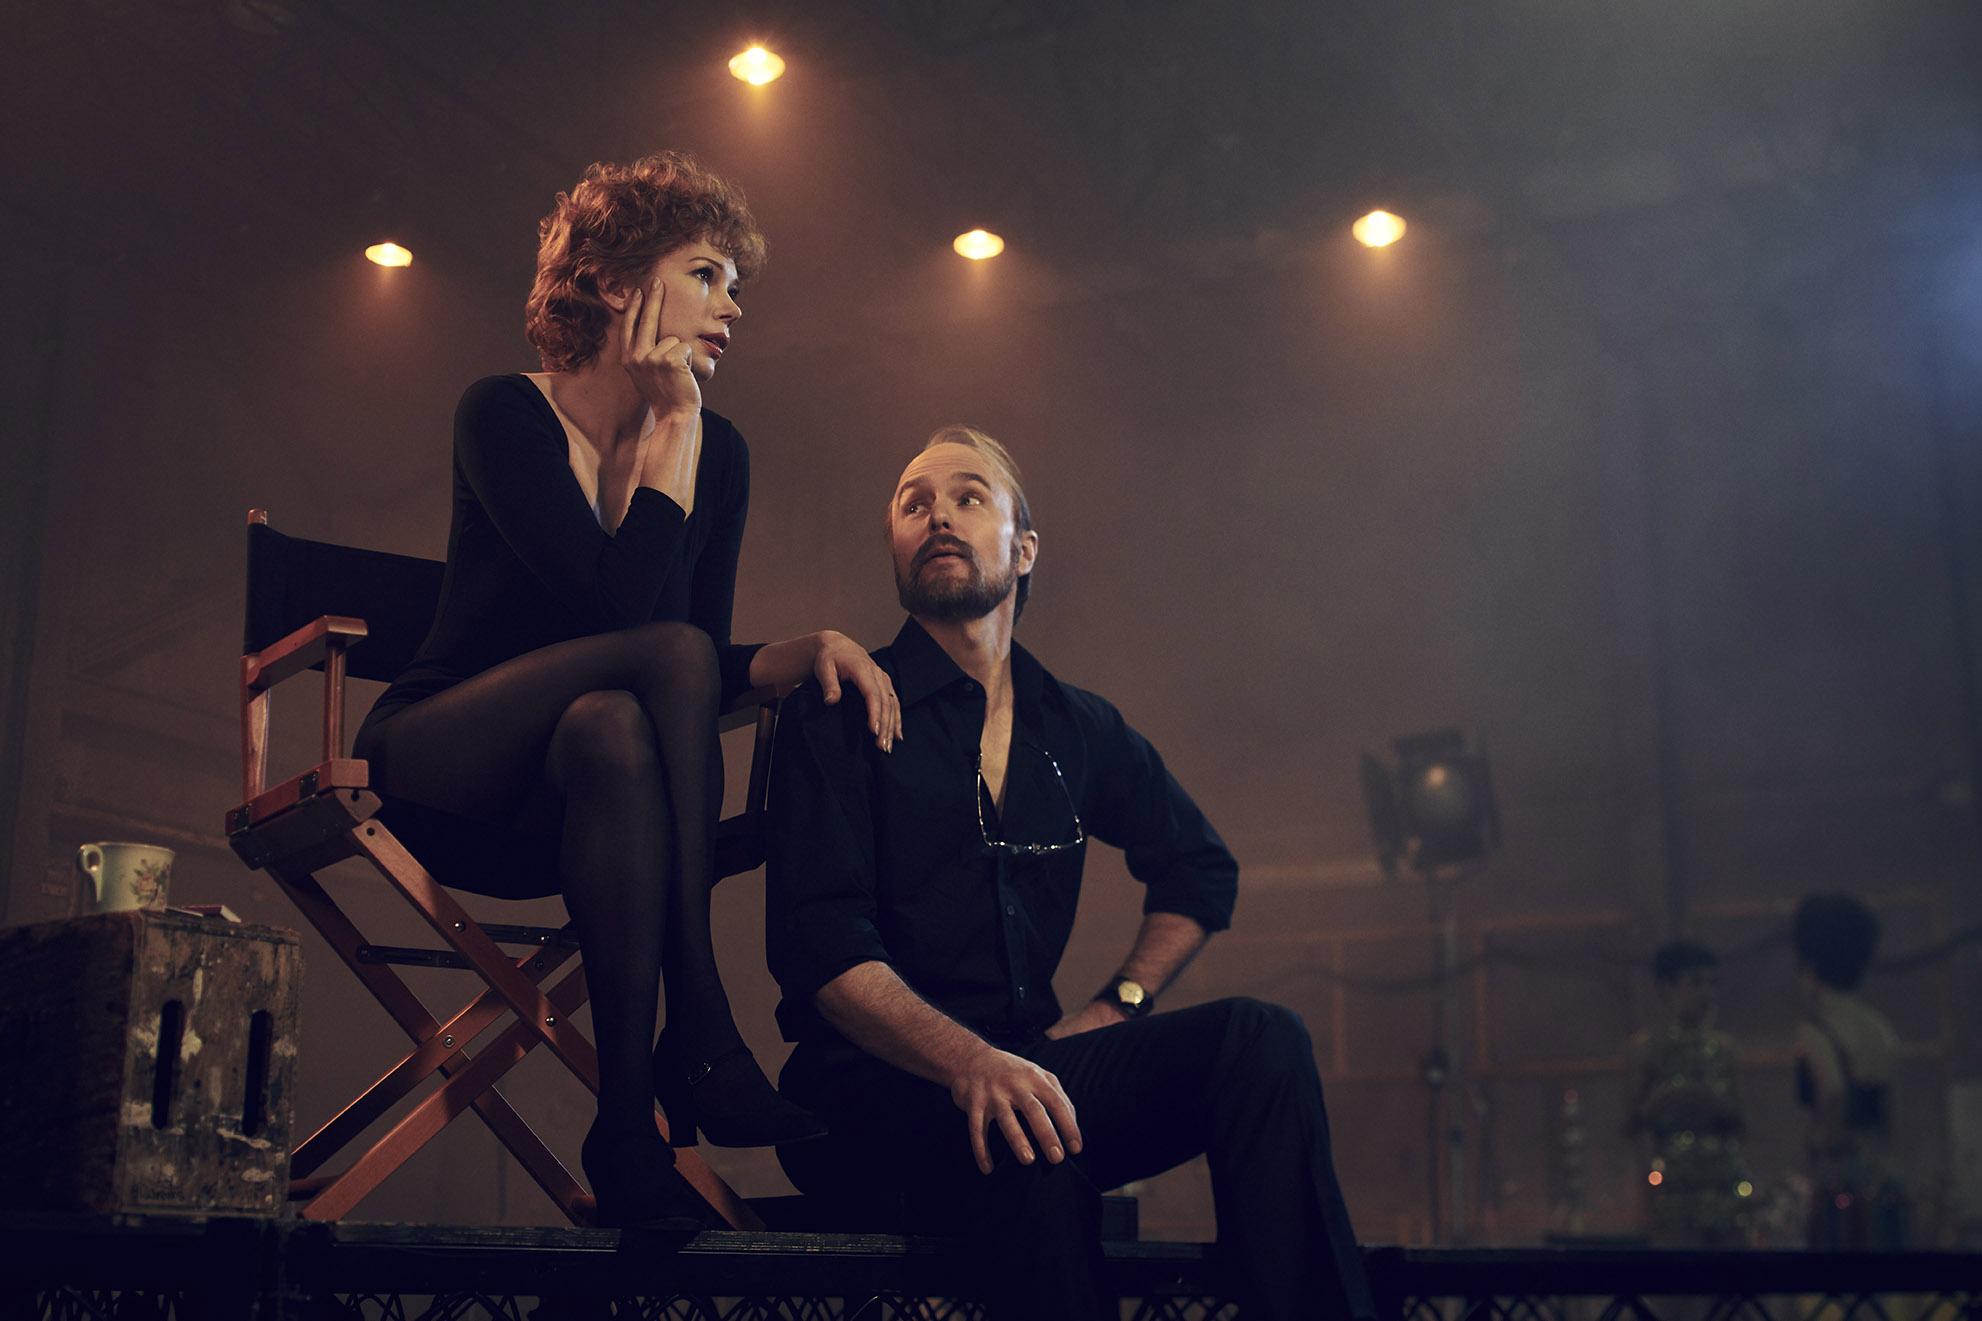 FOSSE VERDON -- Pictured: (l-r) Michelle Williams as Gwen Verdon, Sam Rockwell as Bob Fosse. CR: Pari Dukovic/FX